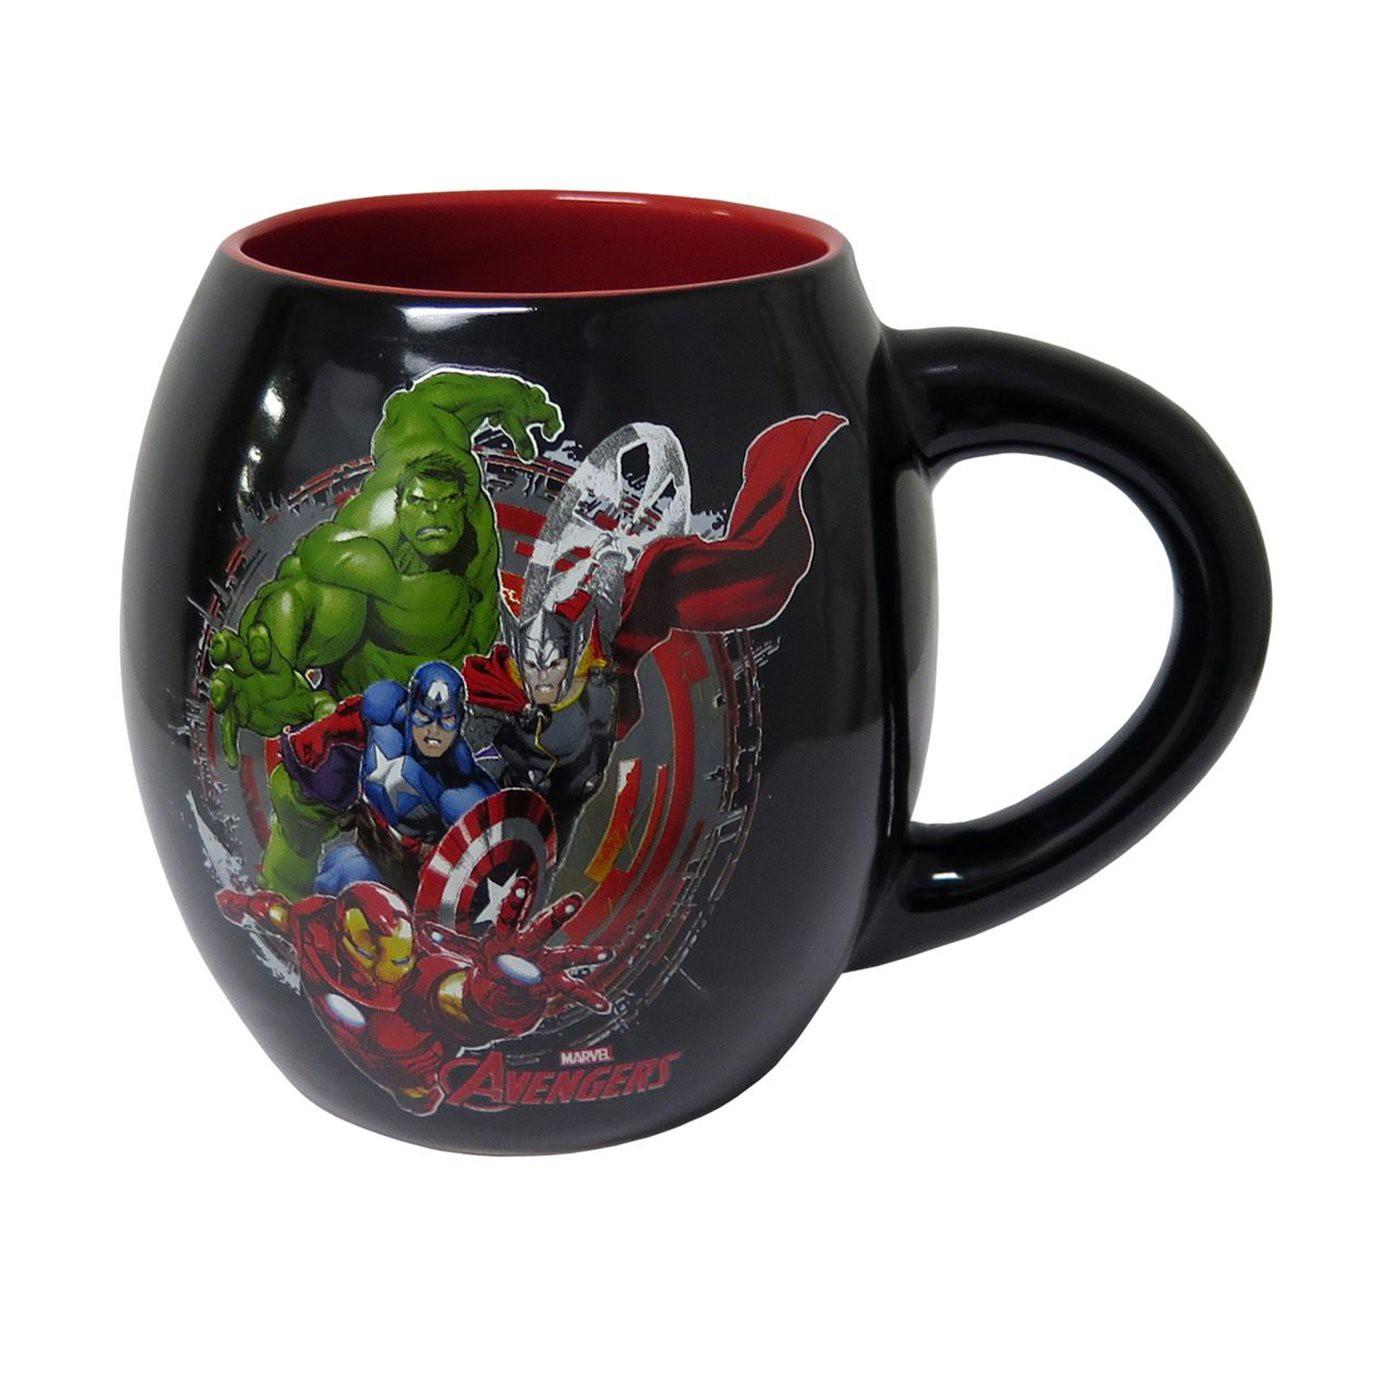 Avengers Assemble 18oz Barrel Mug